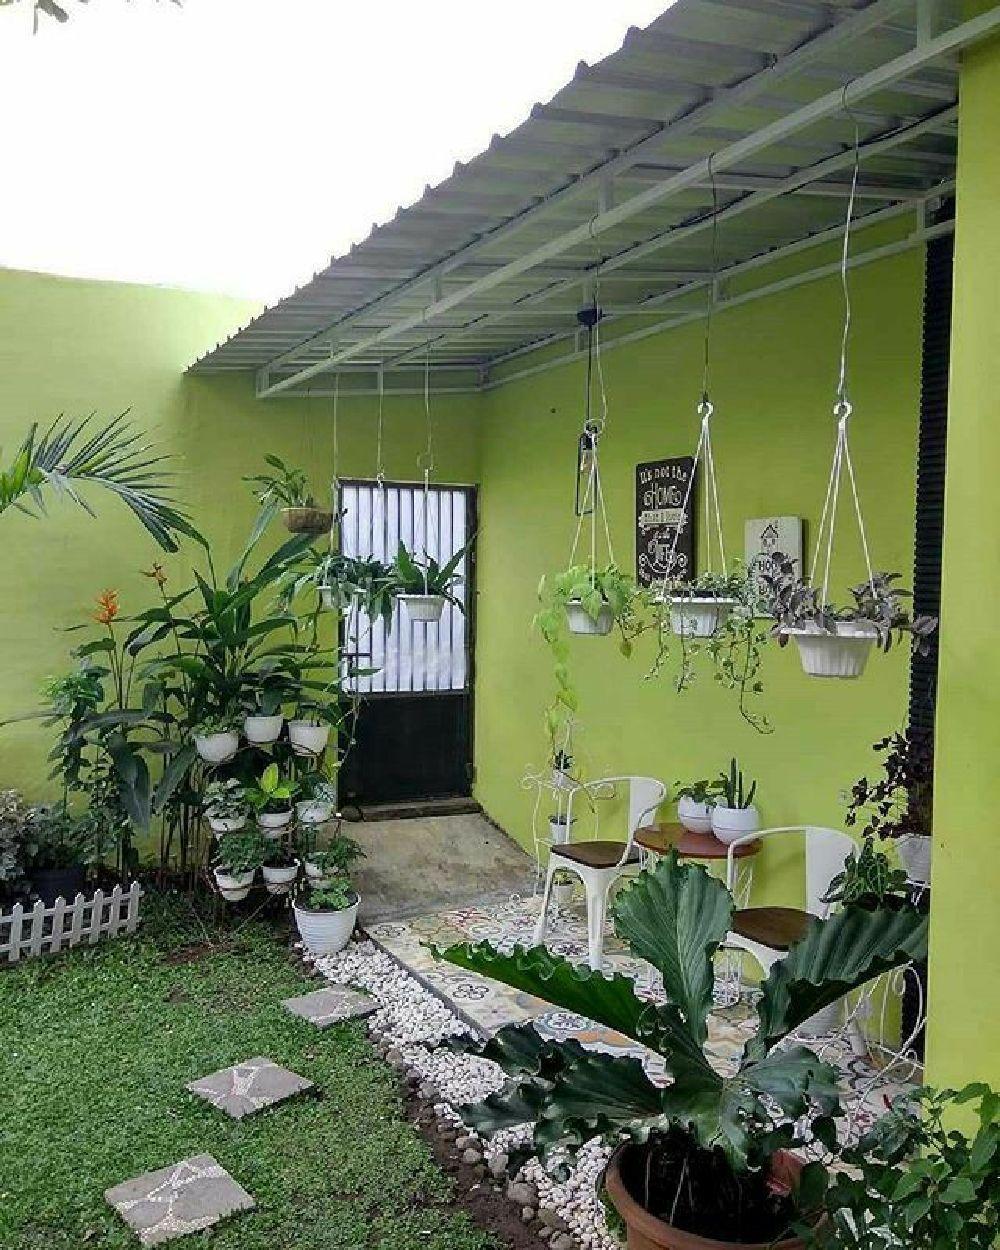 50 Best Small Backyard Garden Design Ideas Jardins Pequenos Decoracao De Terraco Jardinagem E Decoracao Small backyard house design